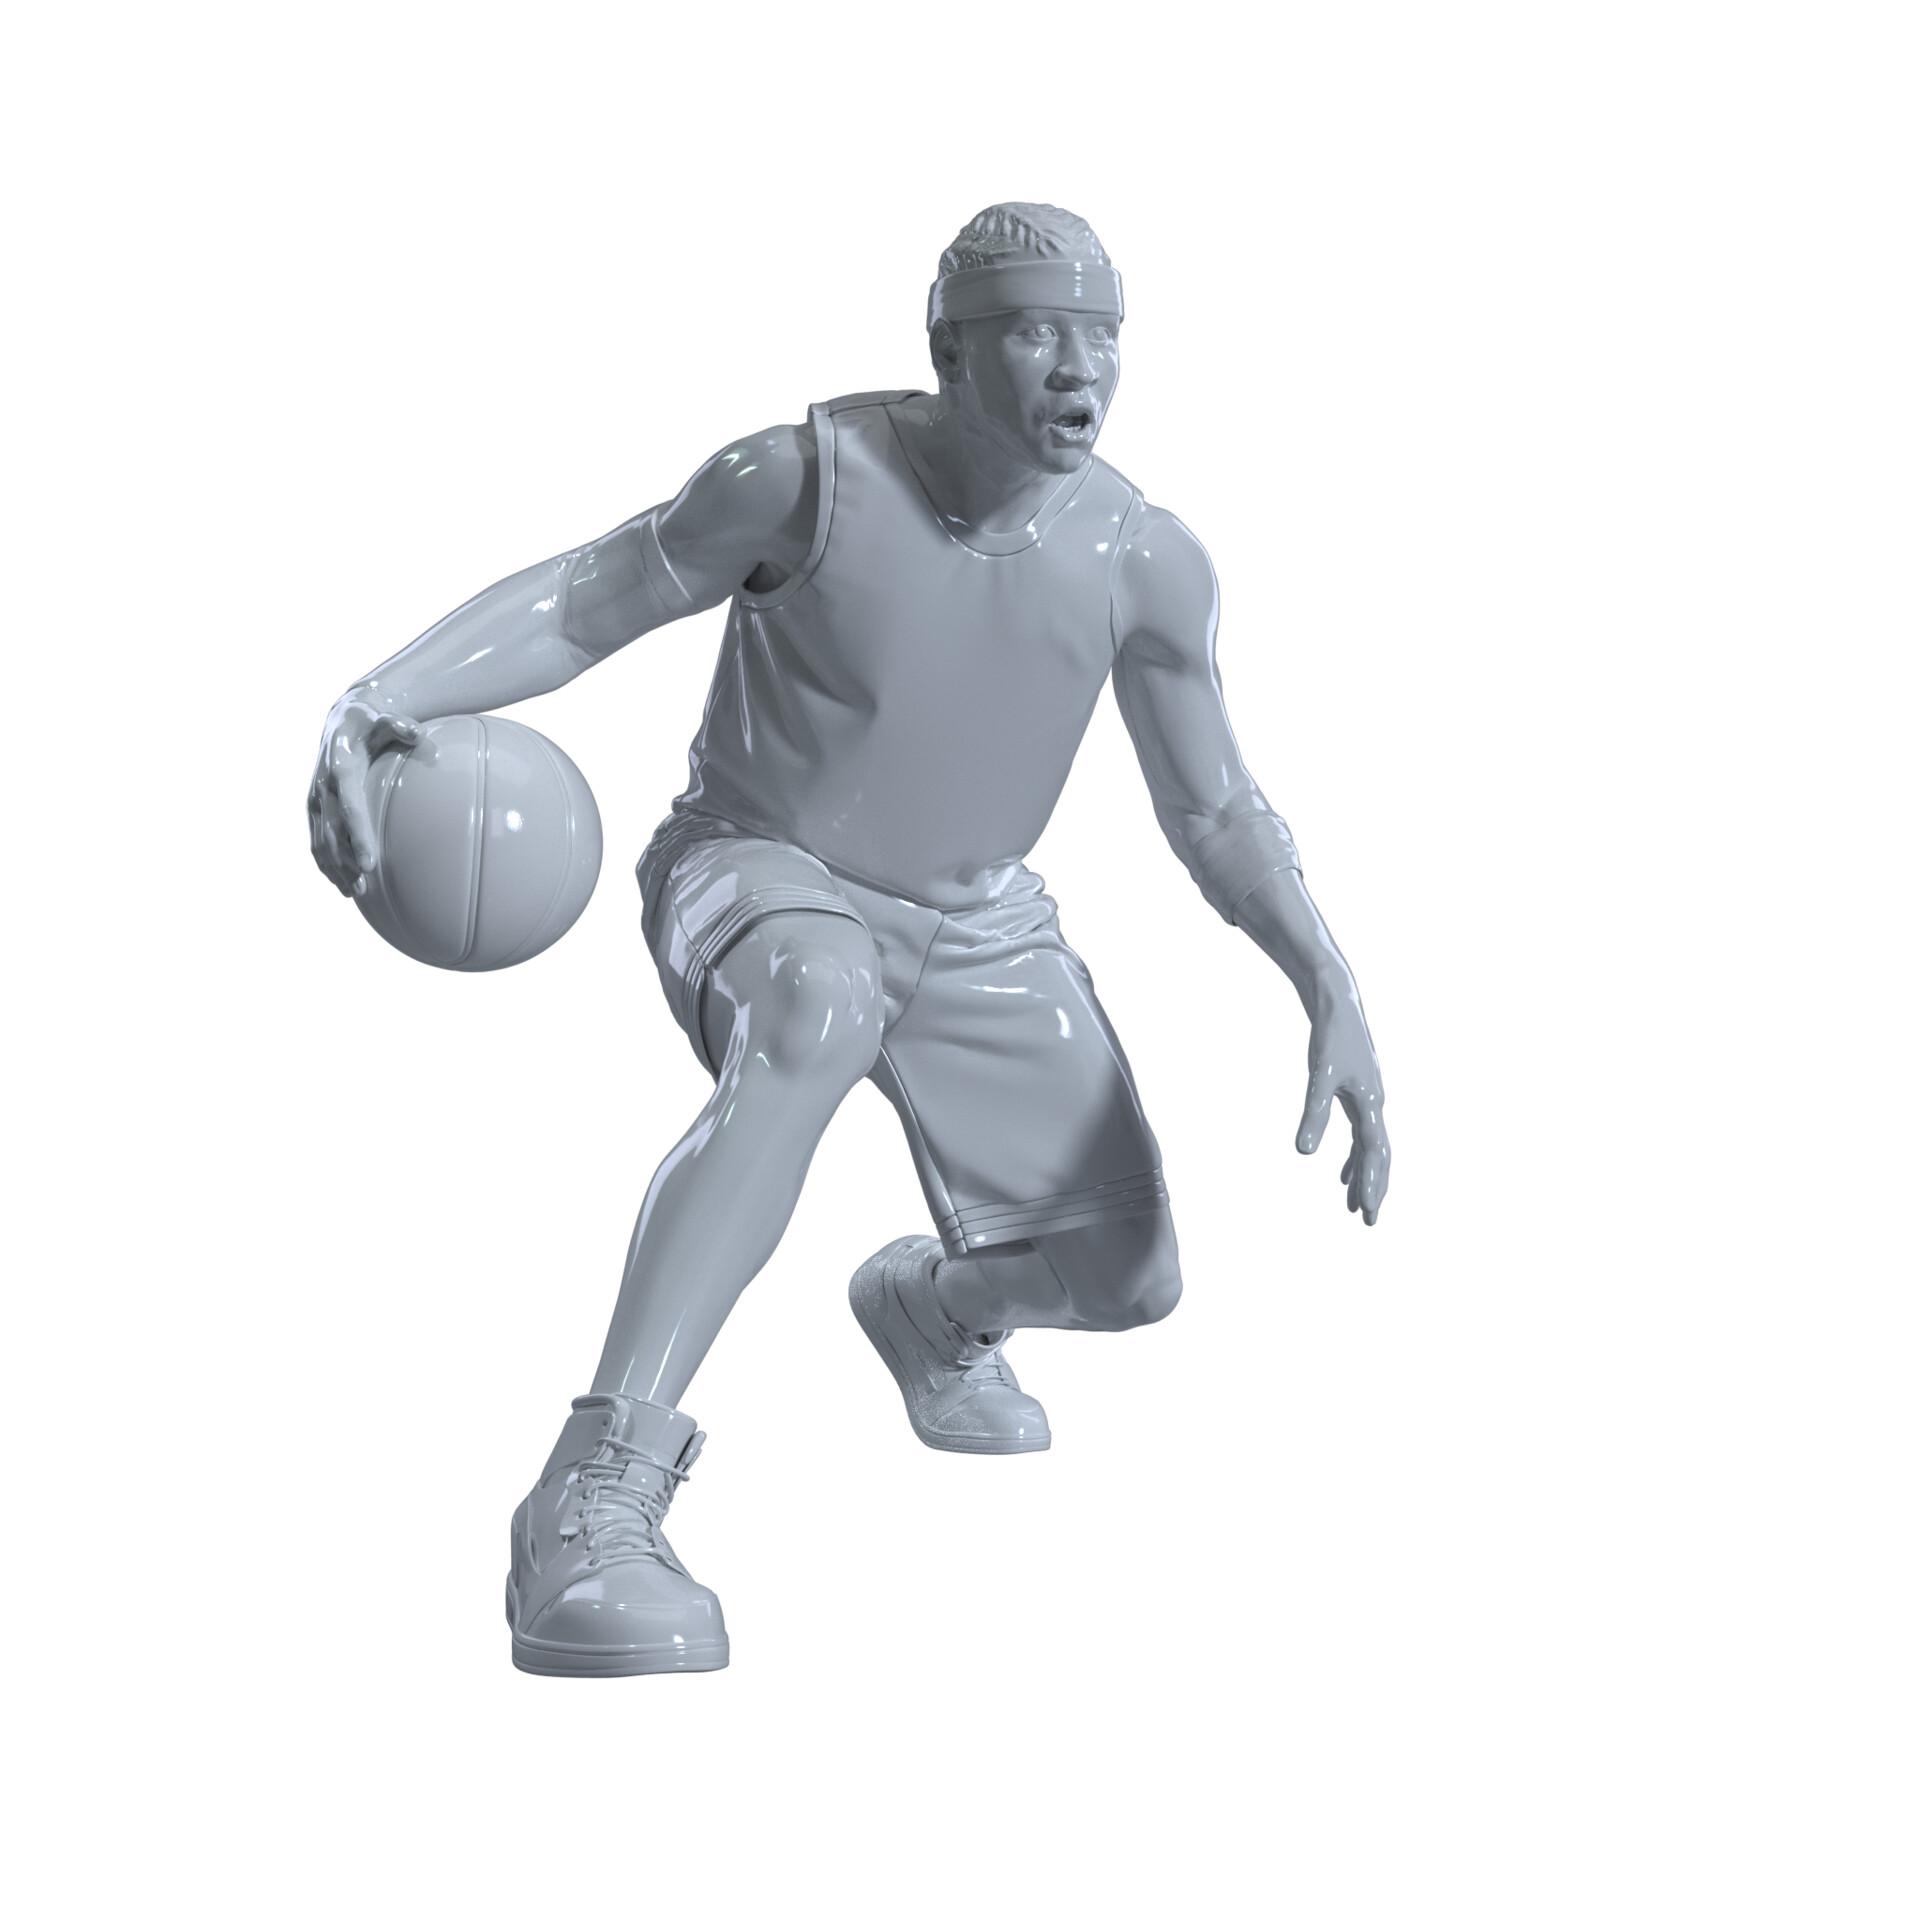 Fabrizio Bogado - ESPN - 3D modelling for NBA players